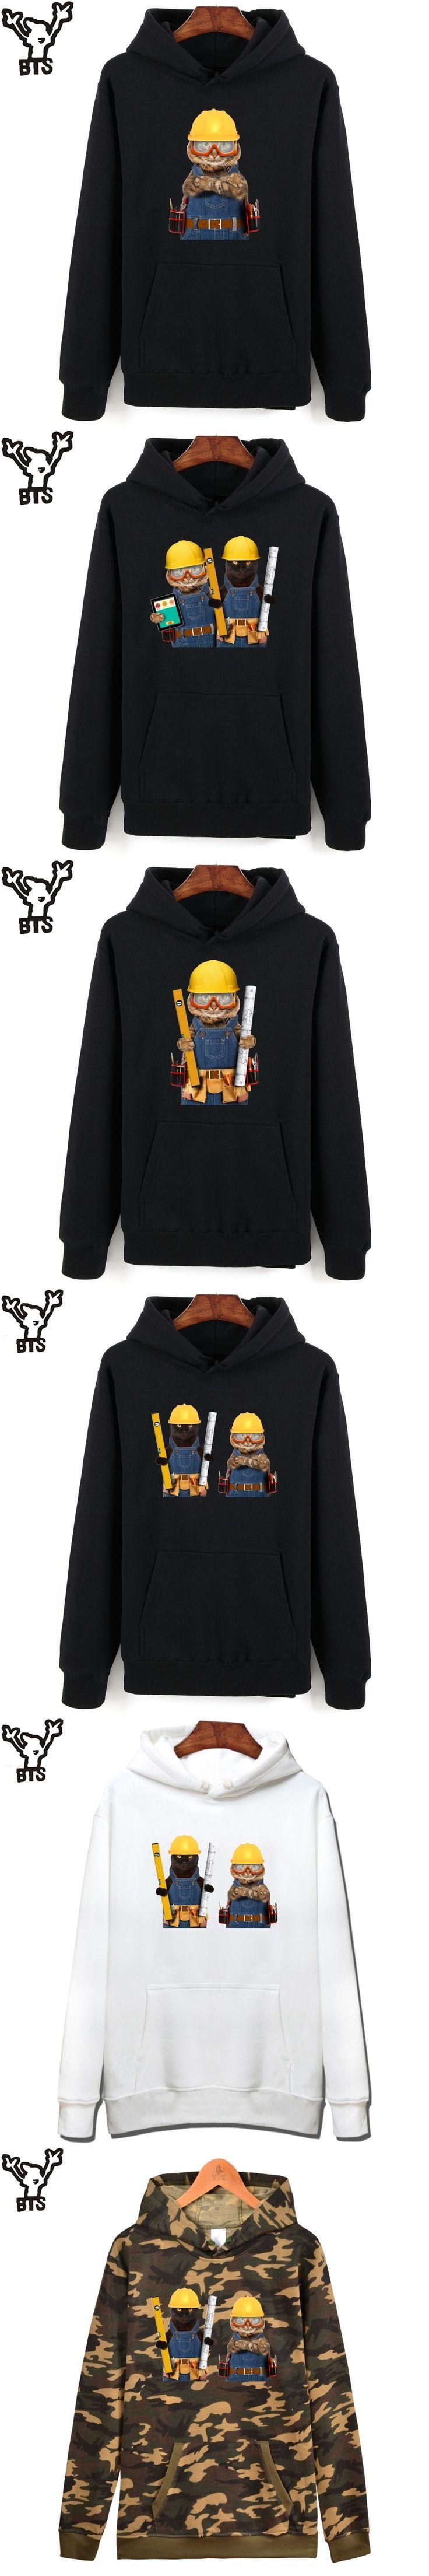 BTS Builder Cat Mens Hoodies And Sweatshirts Casual Engineer Cat Cartoon Capless Hoodies Men Fashion Funny Streetwear Clothes